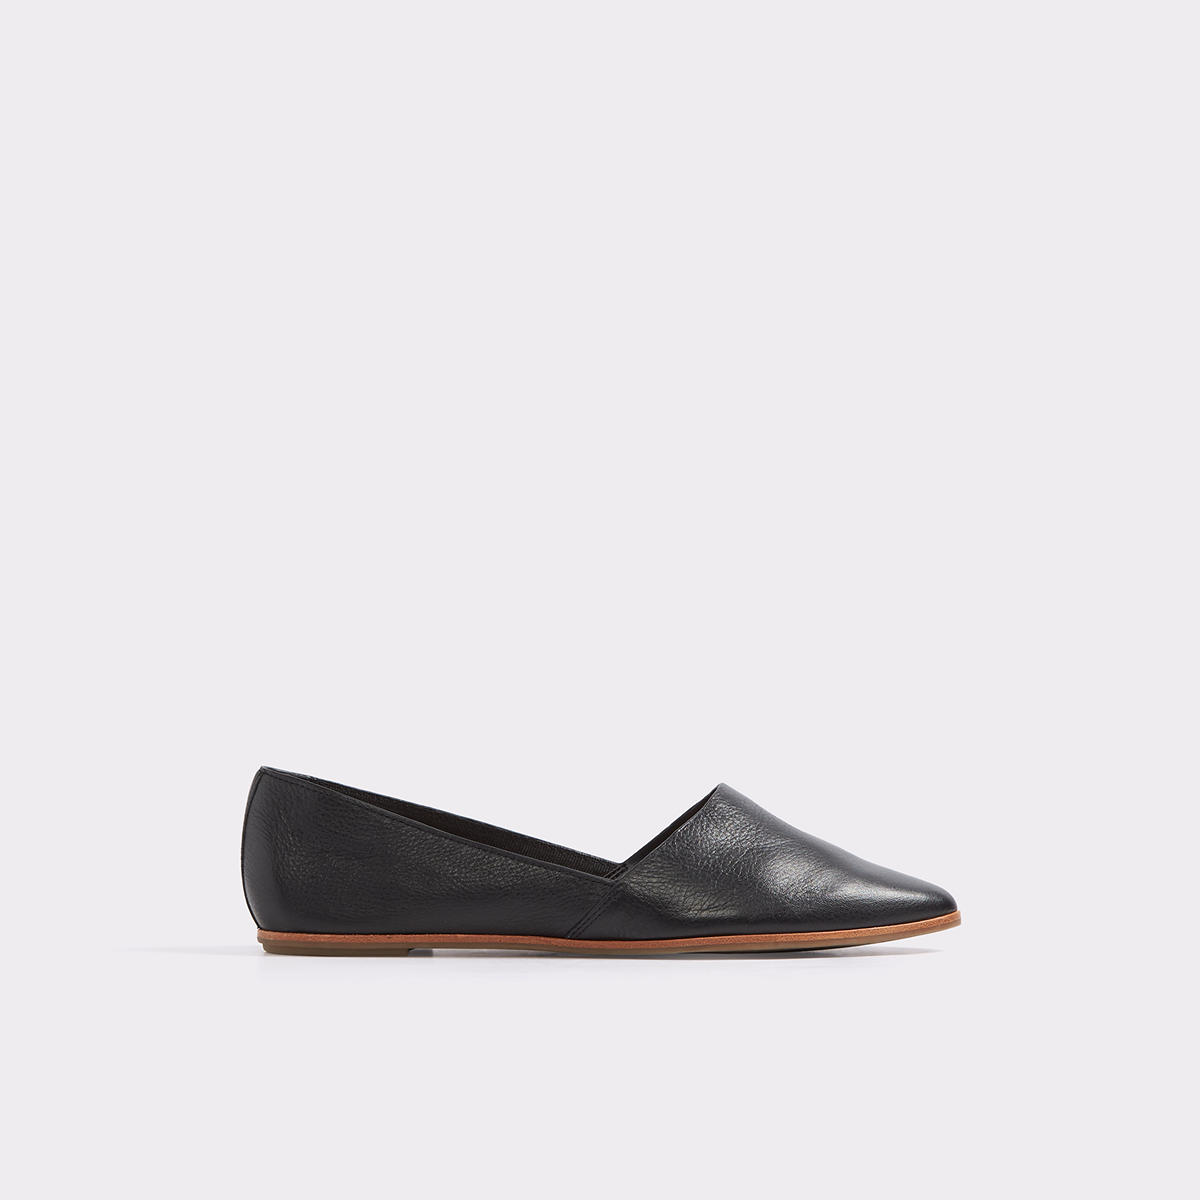 c2496df429f Blanchette Black Women s Loafers